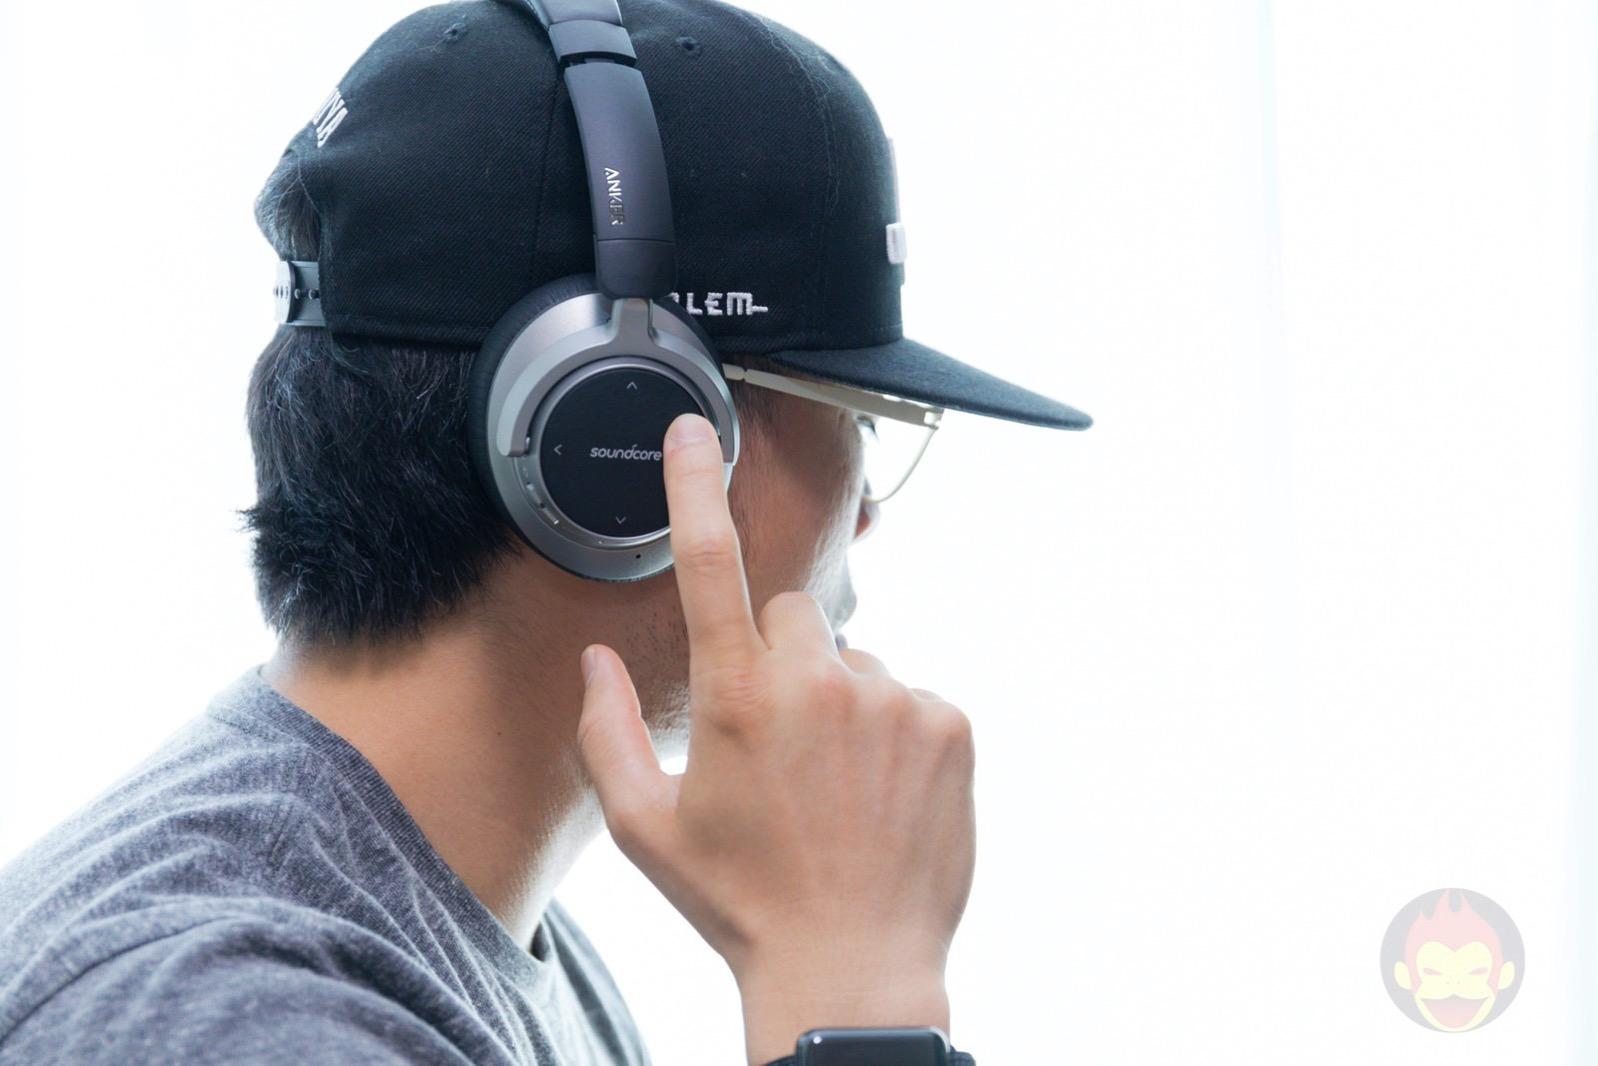 Soundcore-Space-NC-Wireless-Headphones-19.jpg